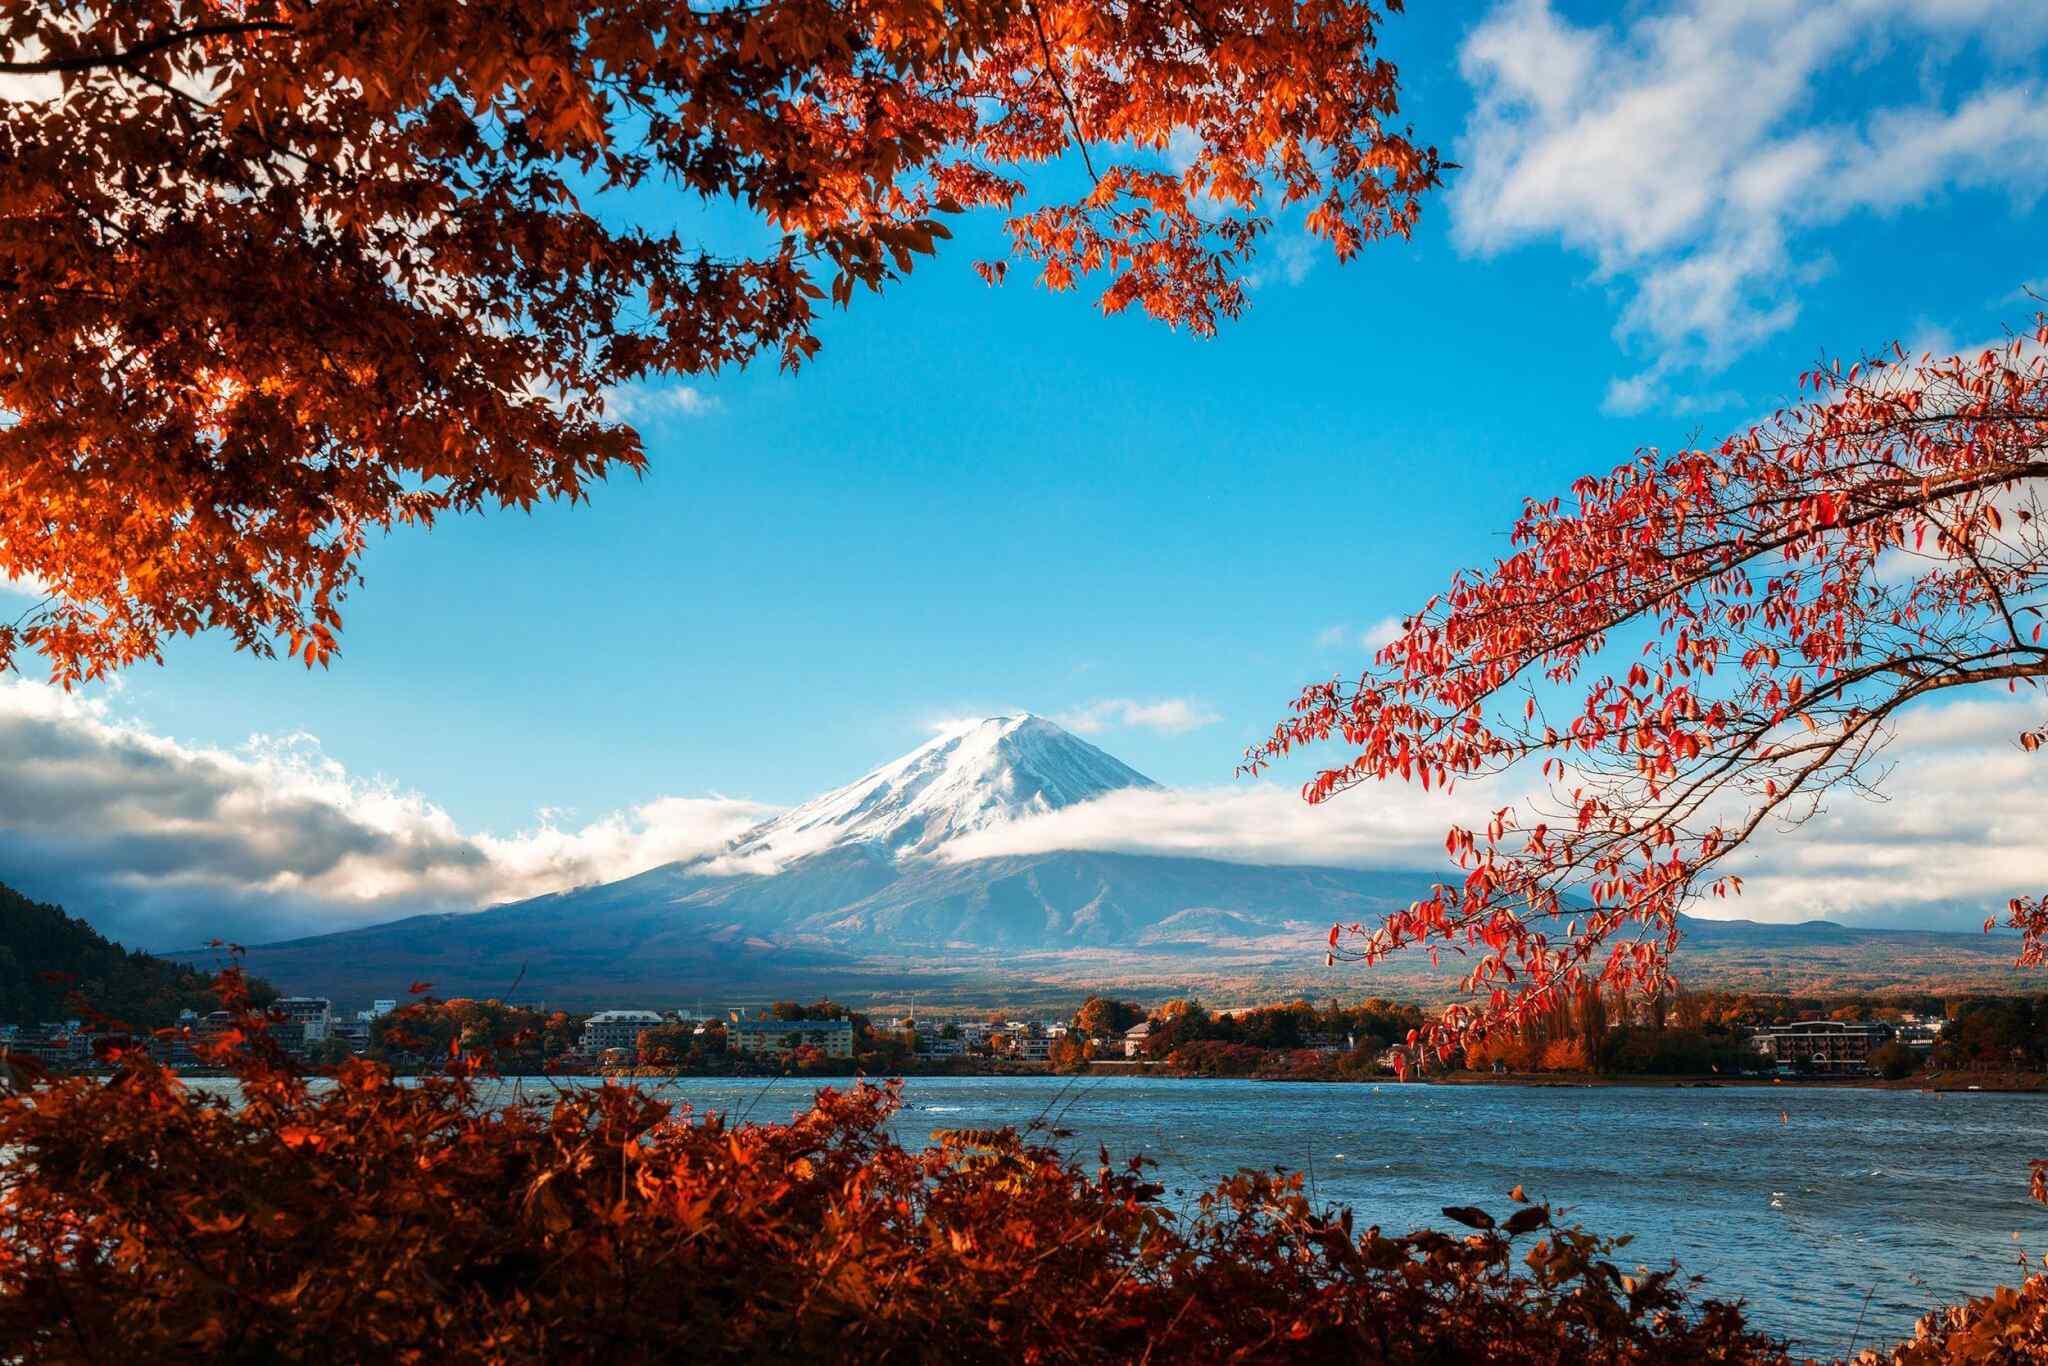 https://ecotours-senegal.com/wp-content/uploads/2018/09/tour-fuji-04.jpg